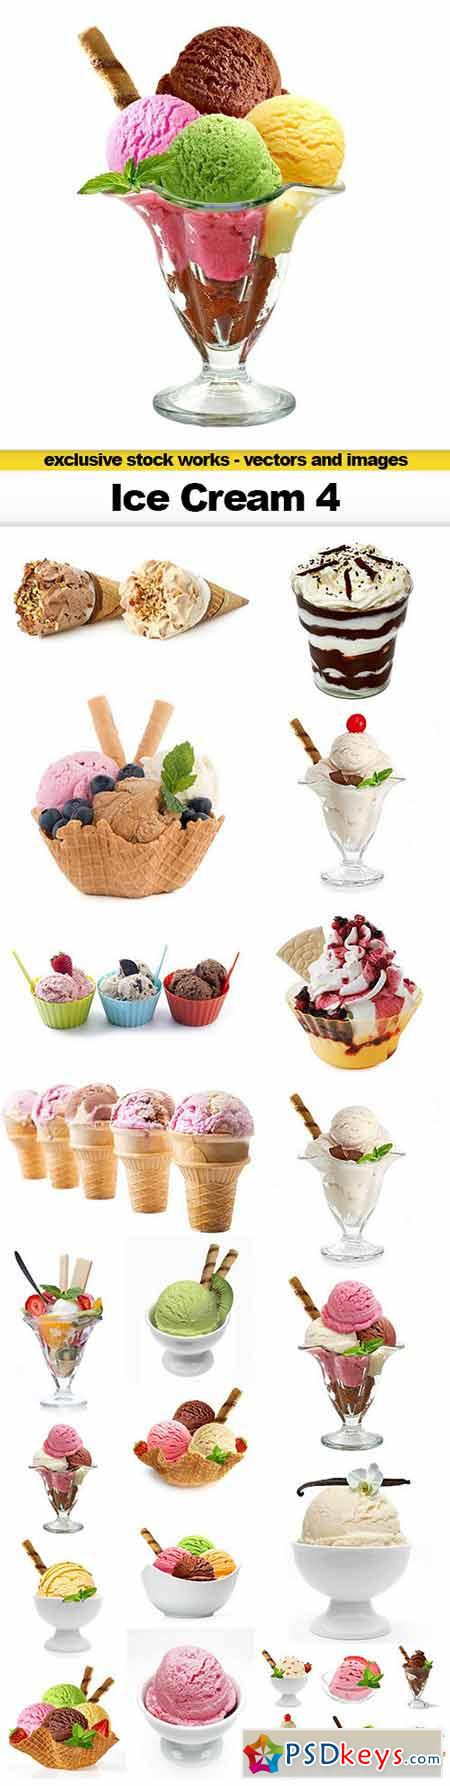 Ice Cream 4 - 20x UHQ JPEGs